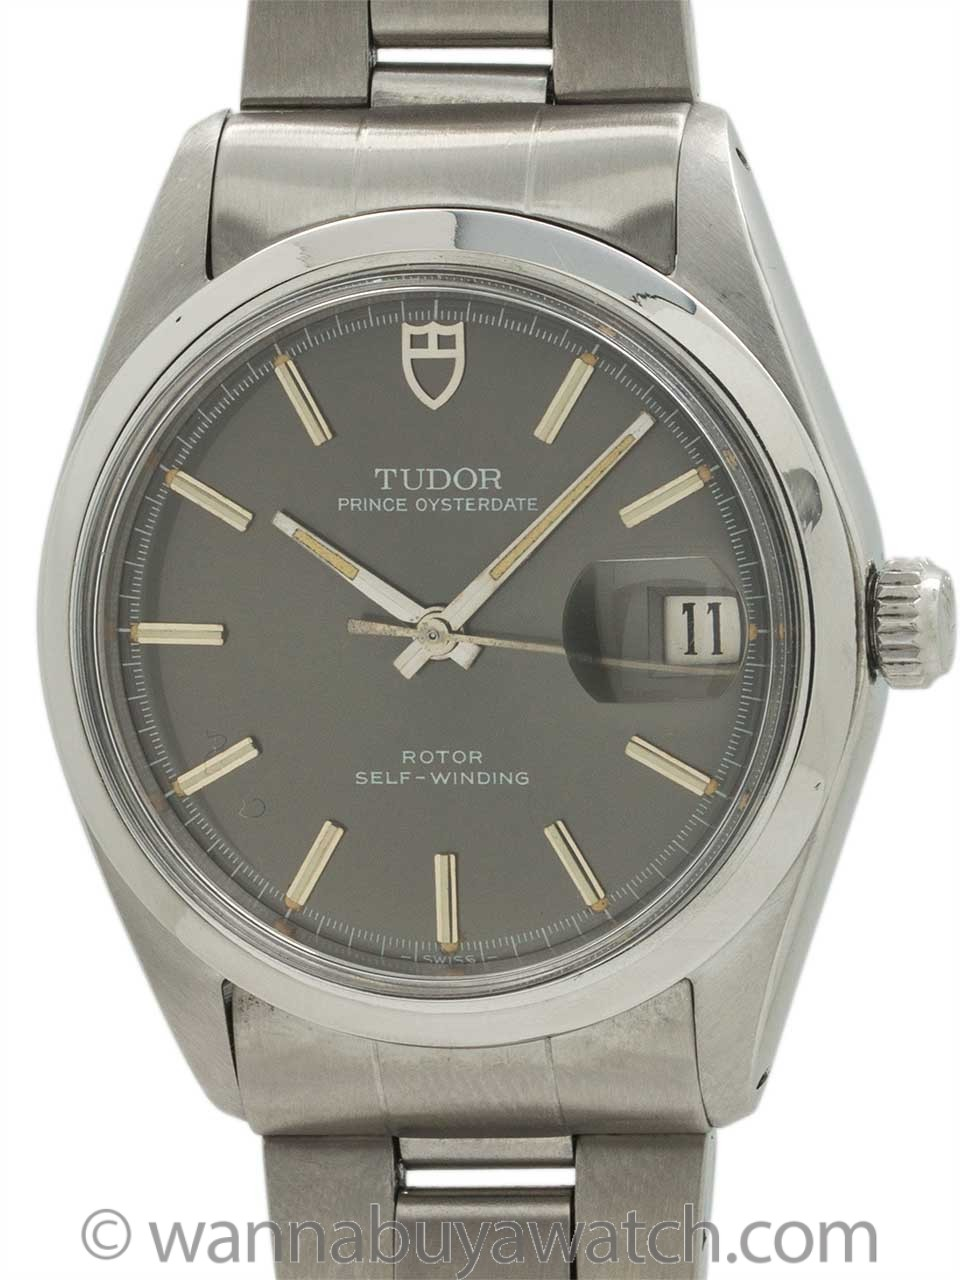 Tudor Prince Oyster Date Perpetual circa 1970's